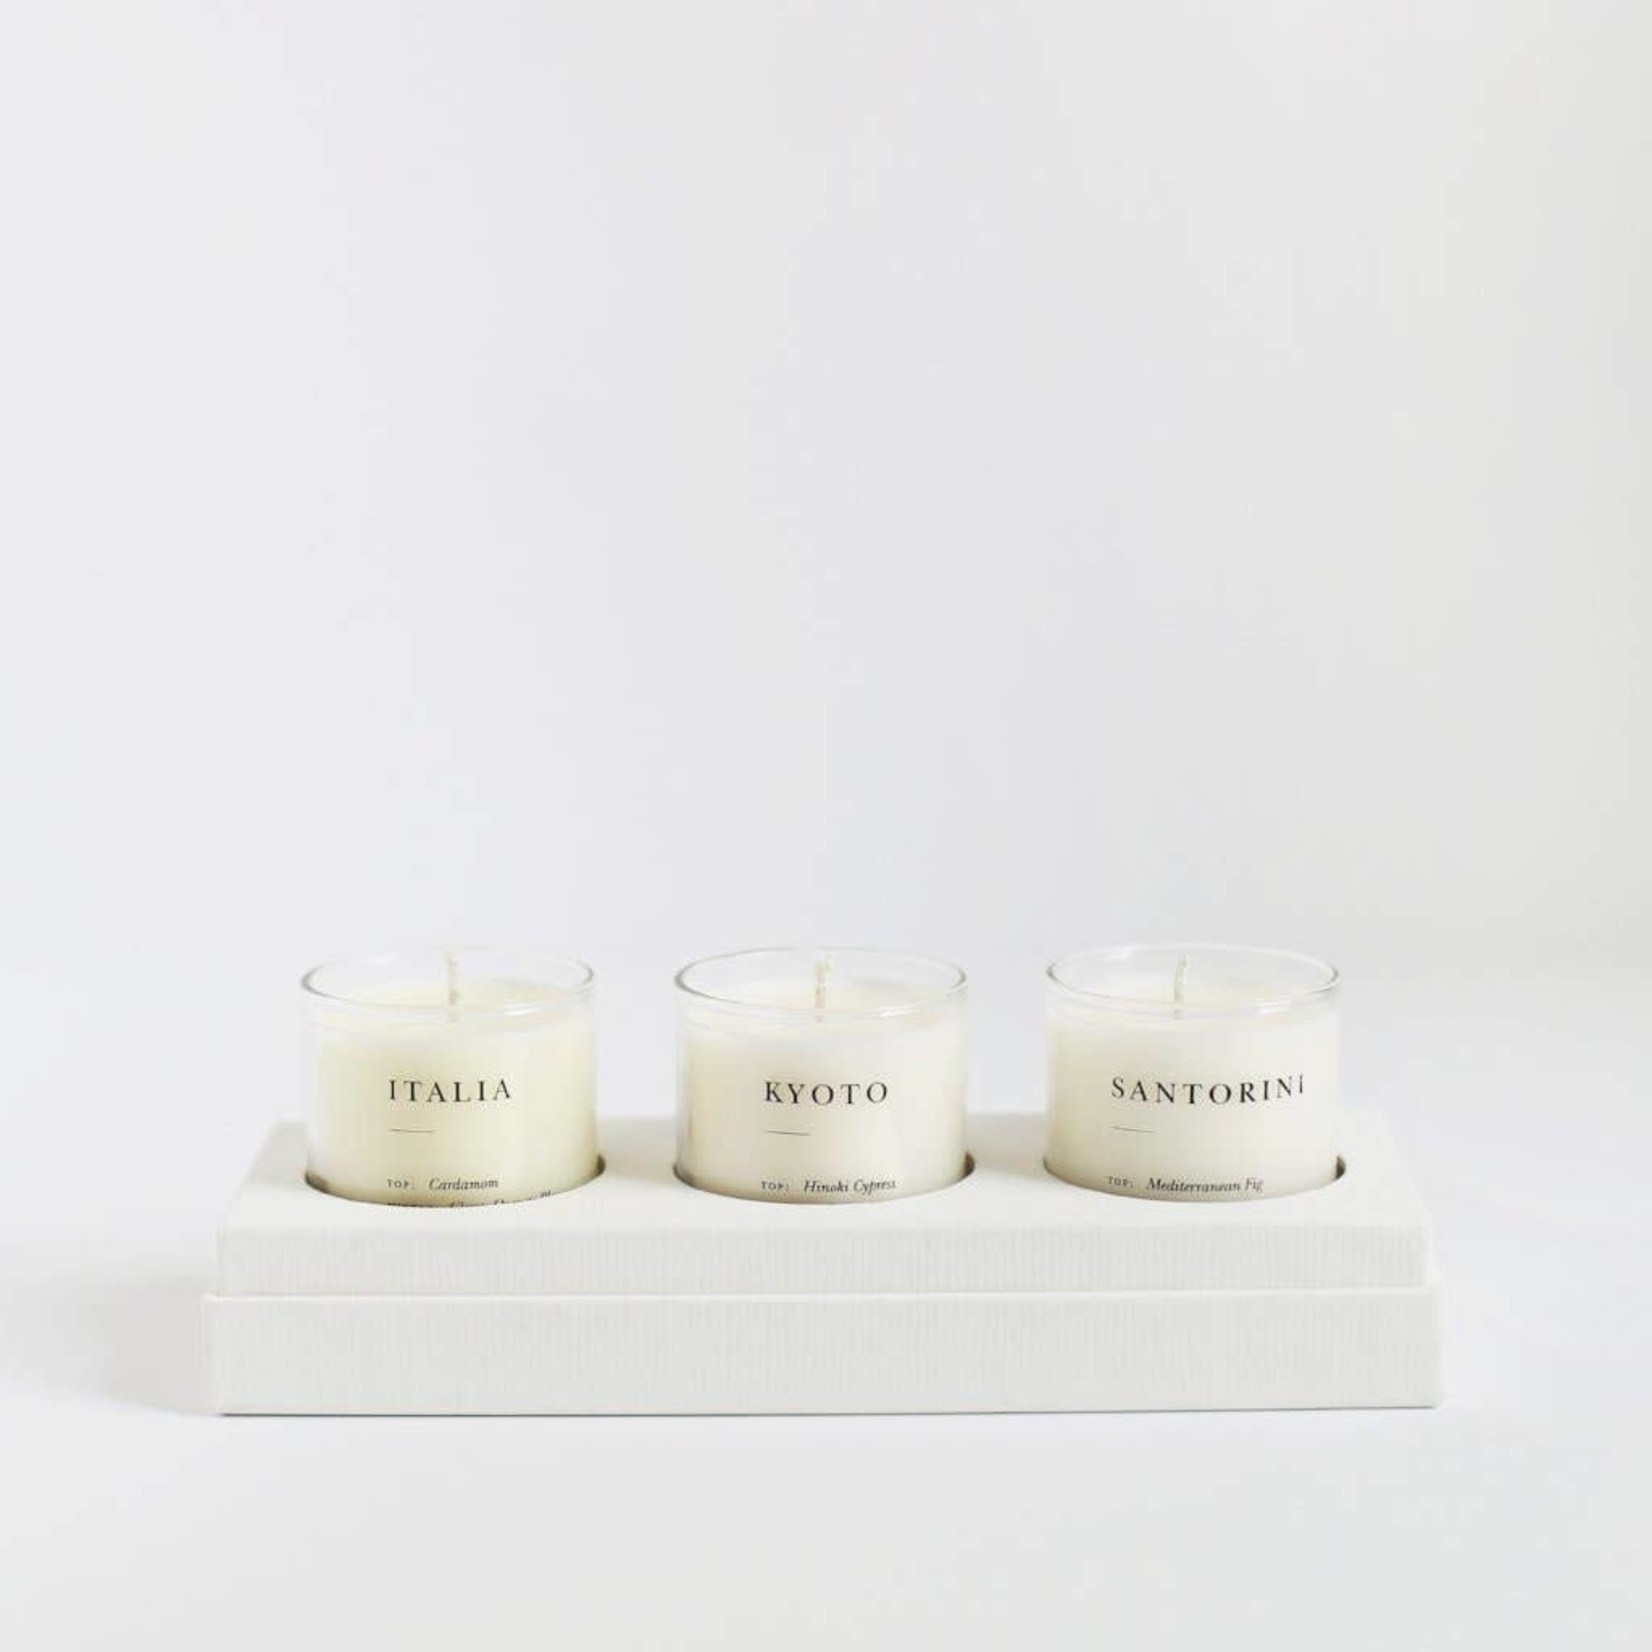 Brooklyn Candle Studio Brooklyn Candle Studio Escapist Gift Set Earthy + Warm (Santorini/Kyoto/Italia)